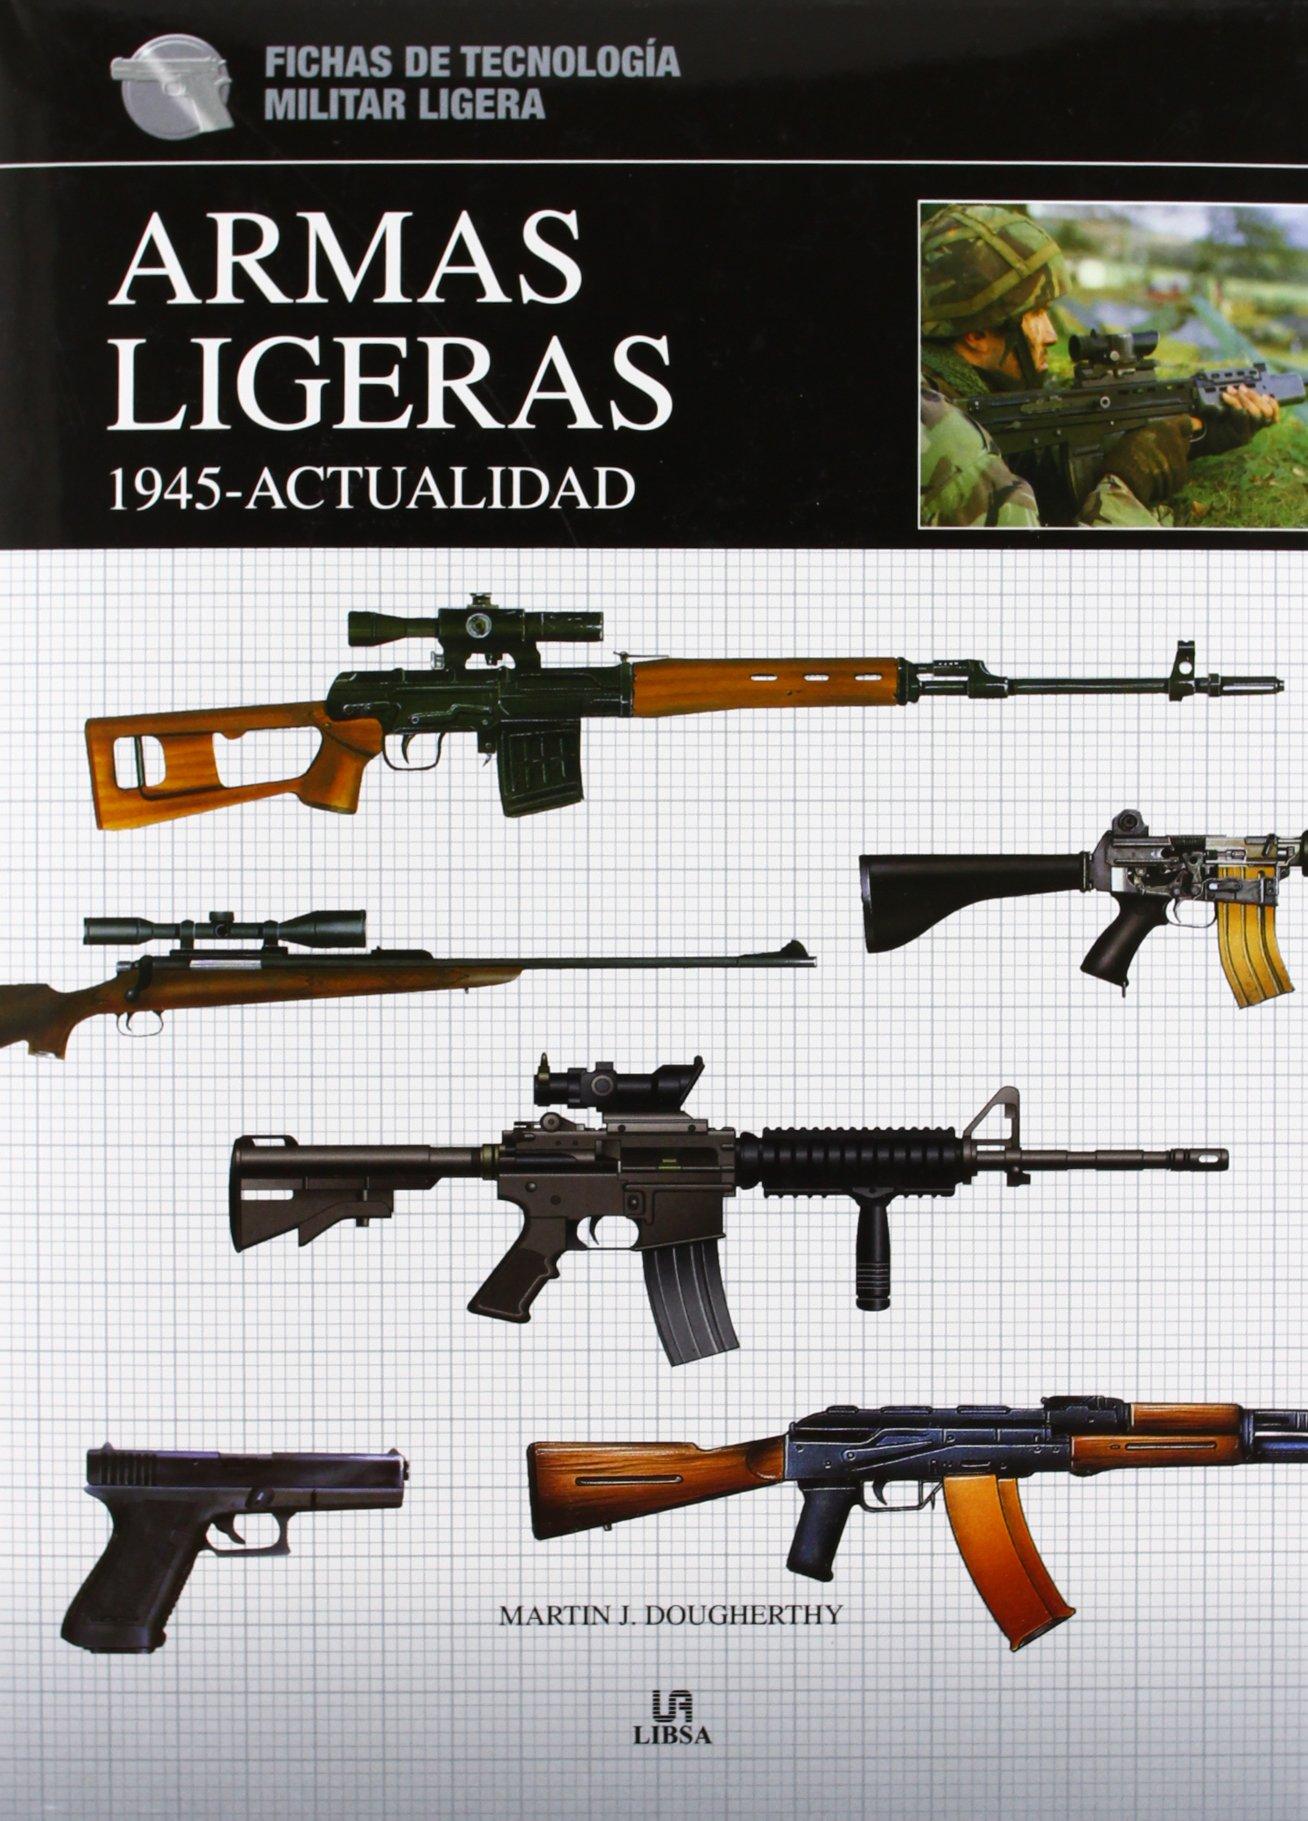 Armas Ligeras 1.945-Actualidad (Fichas de Tecnología Militar) Tapa dura – 8 jul 2012 Martin J. Dougherty Alfredo Martín Comps Libsa 8466225919